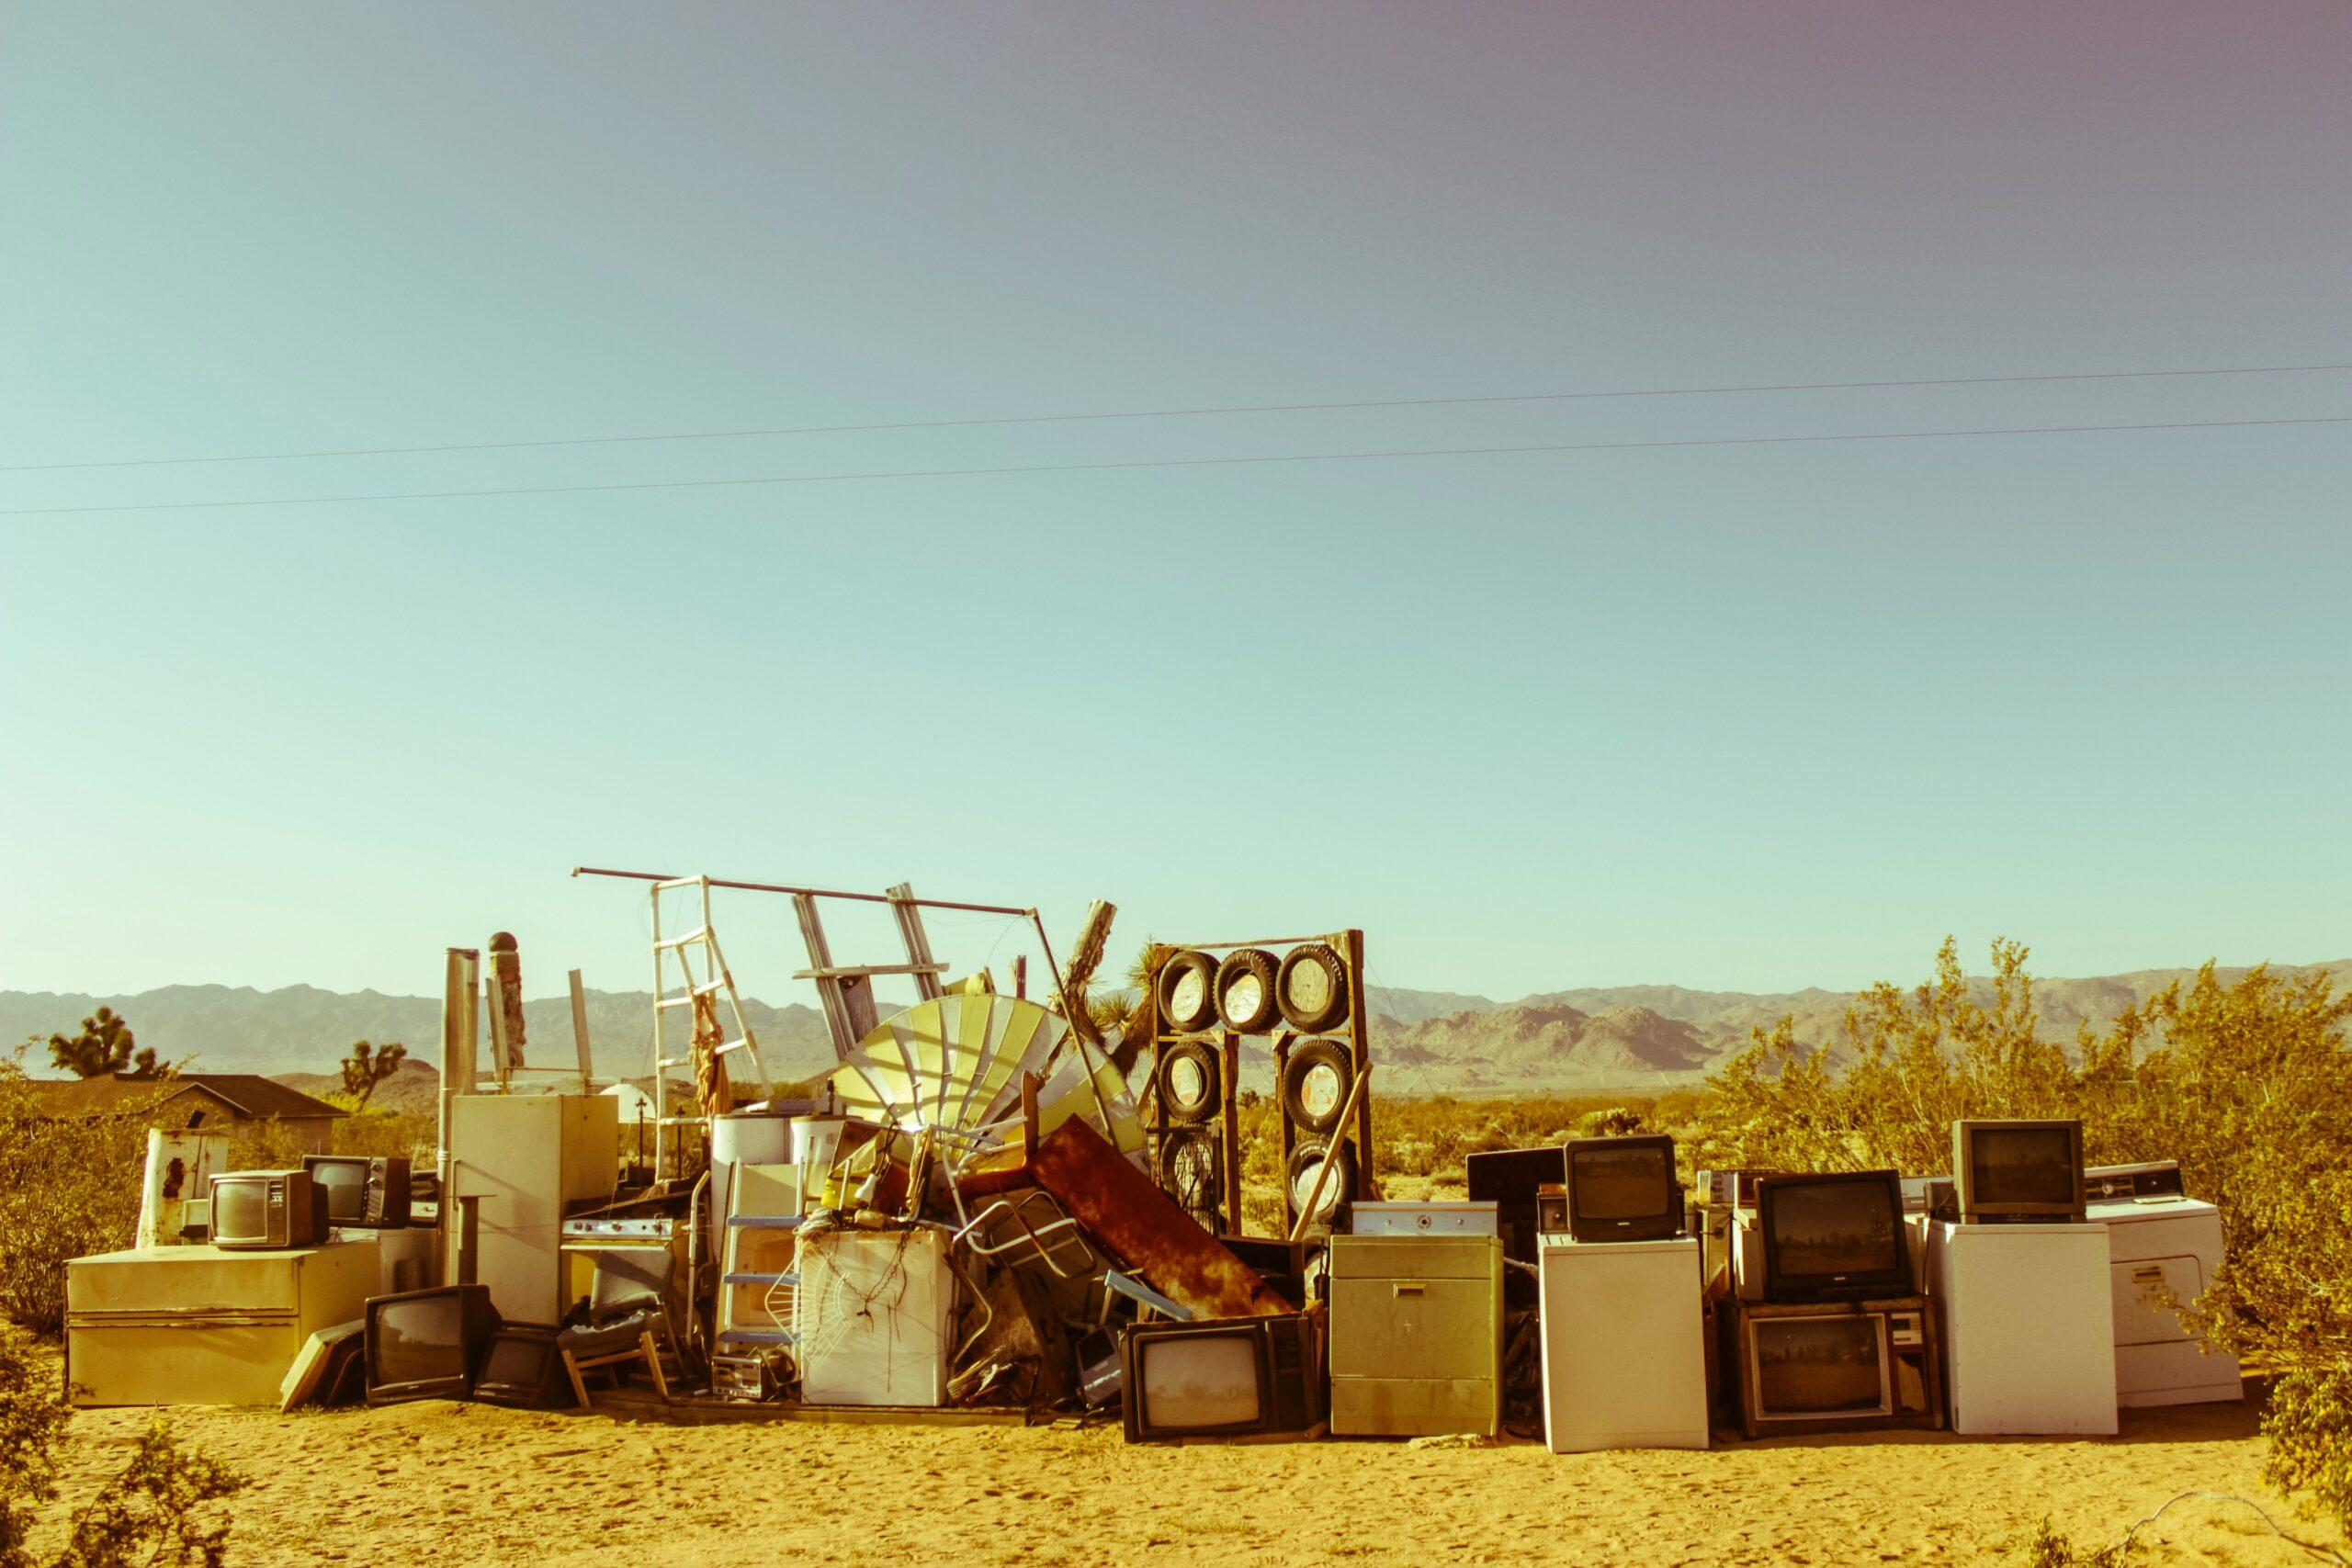 junk hauling company